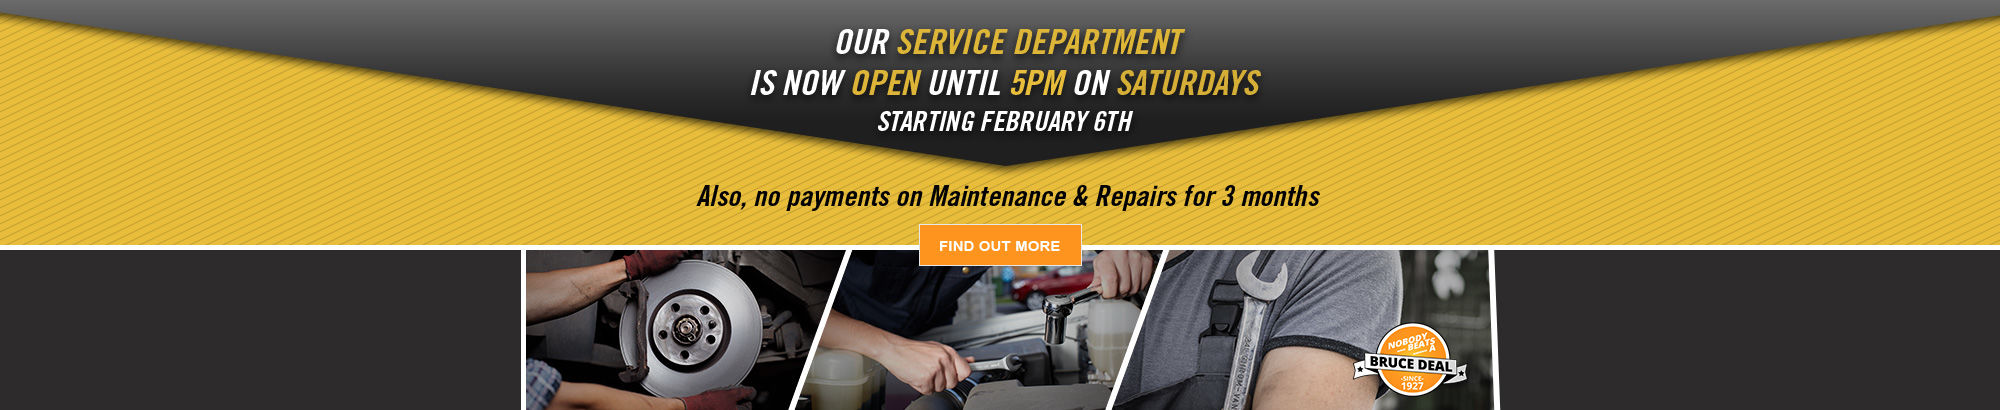 Service Departement New Opening Hours